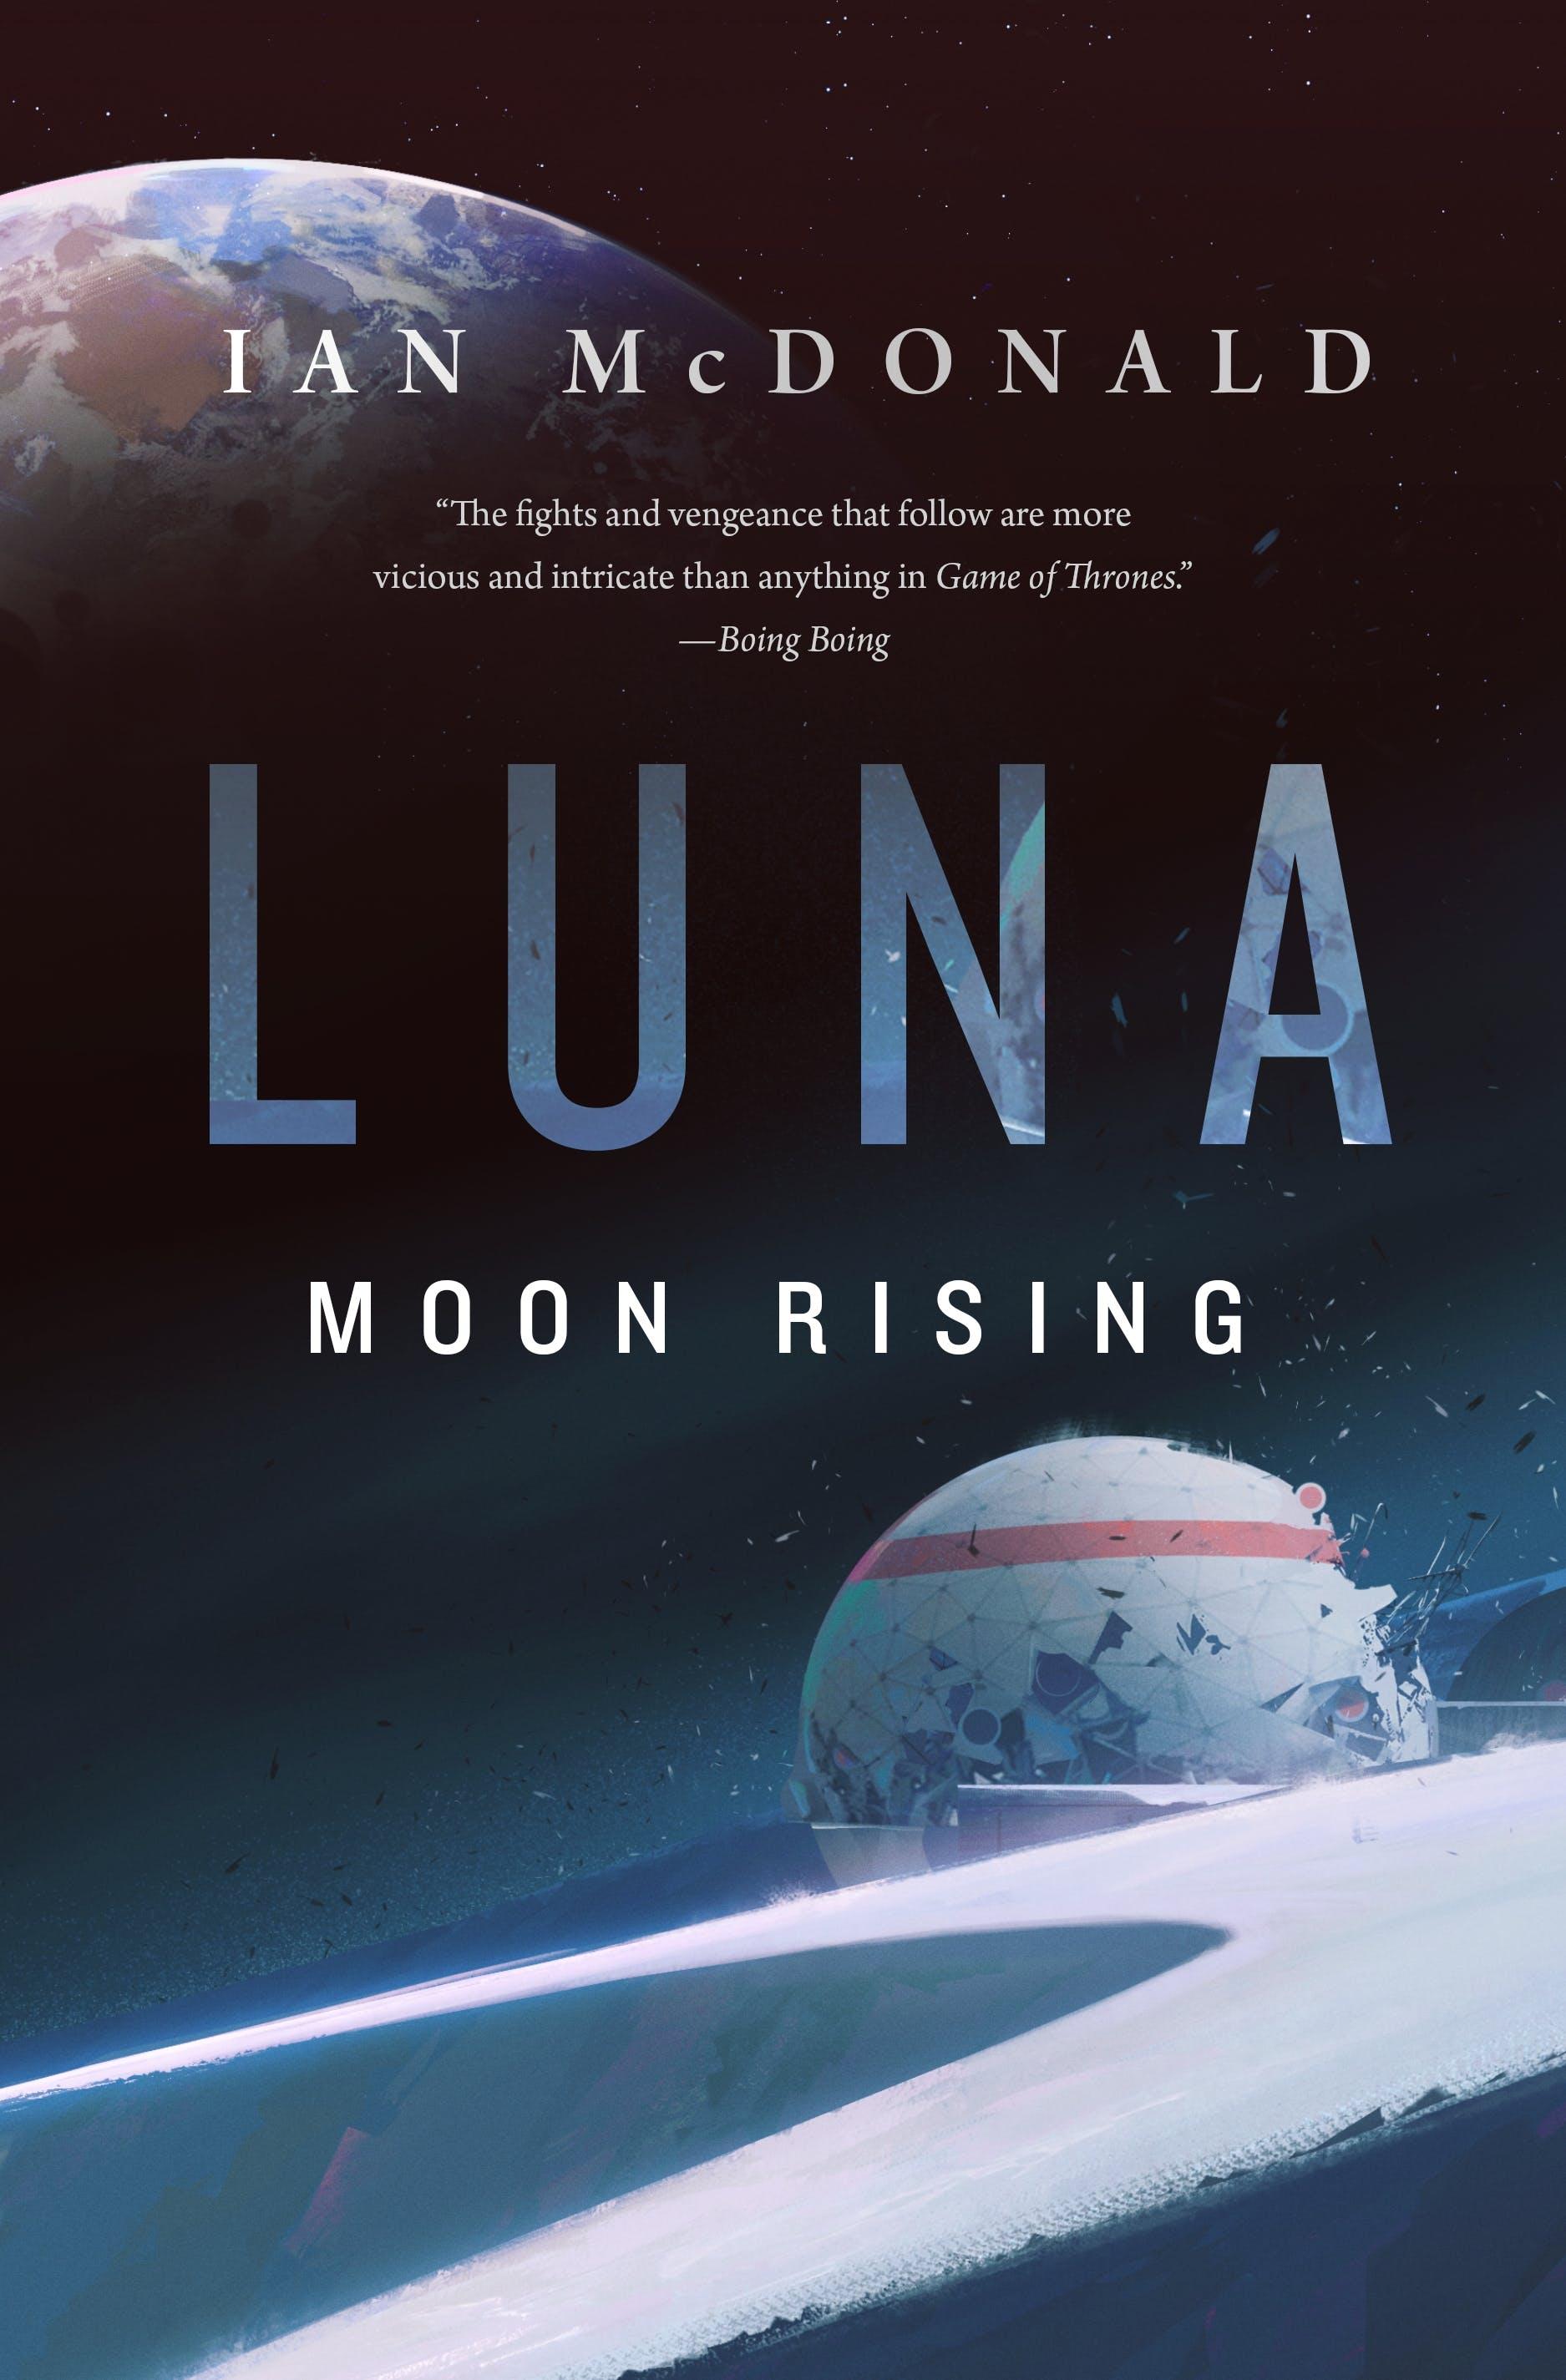 Image of Luna: Moon Rising